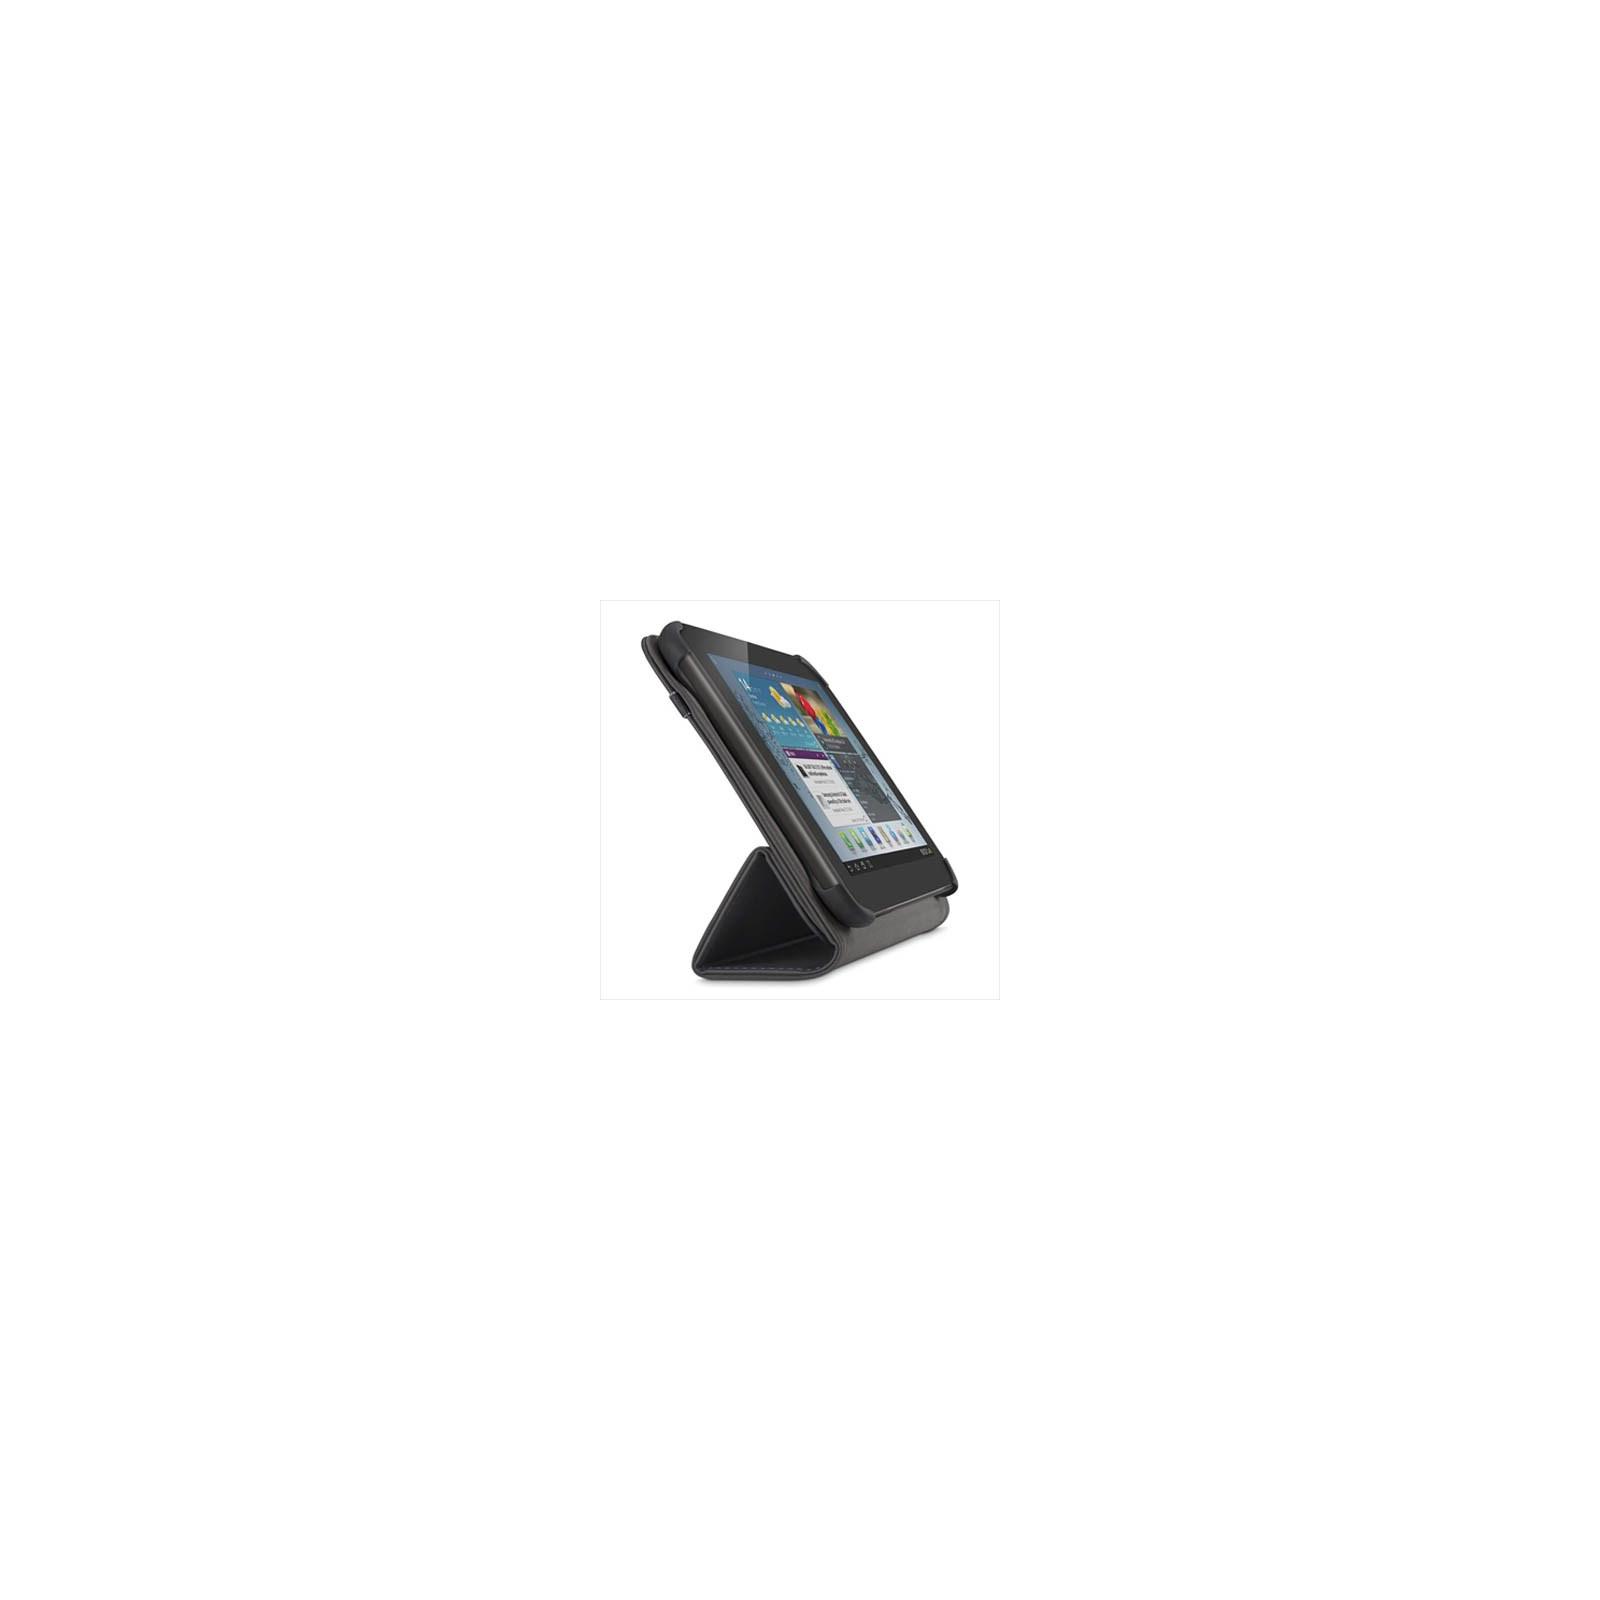 Чехол для планшета Belkin 7 GalaxyTab3 Tri-Fold Cover Stand (F7P120vfC00) изображение 2